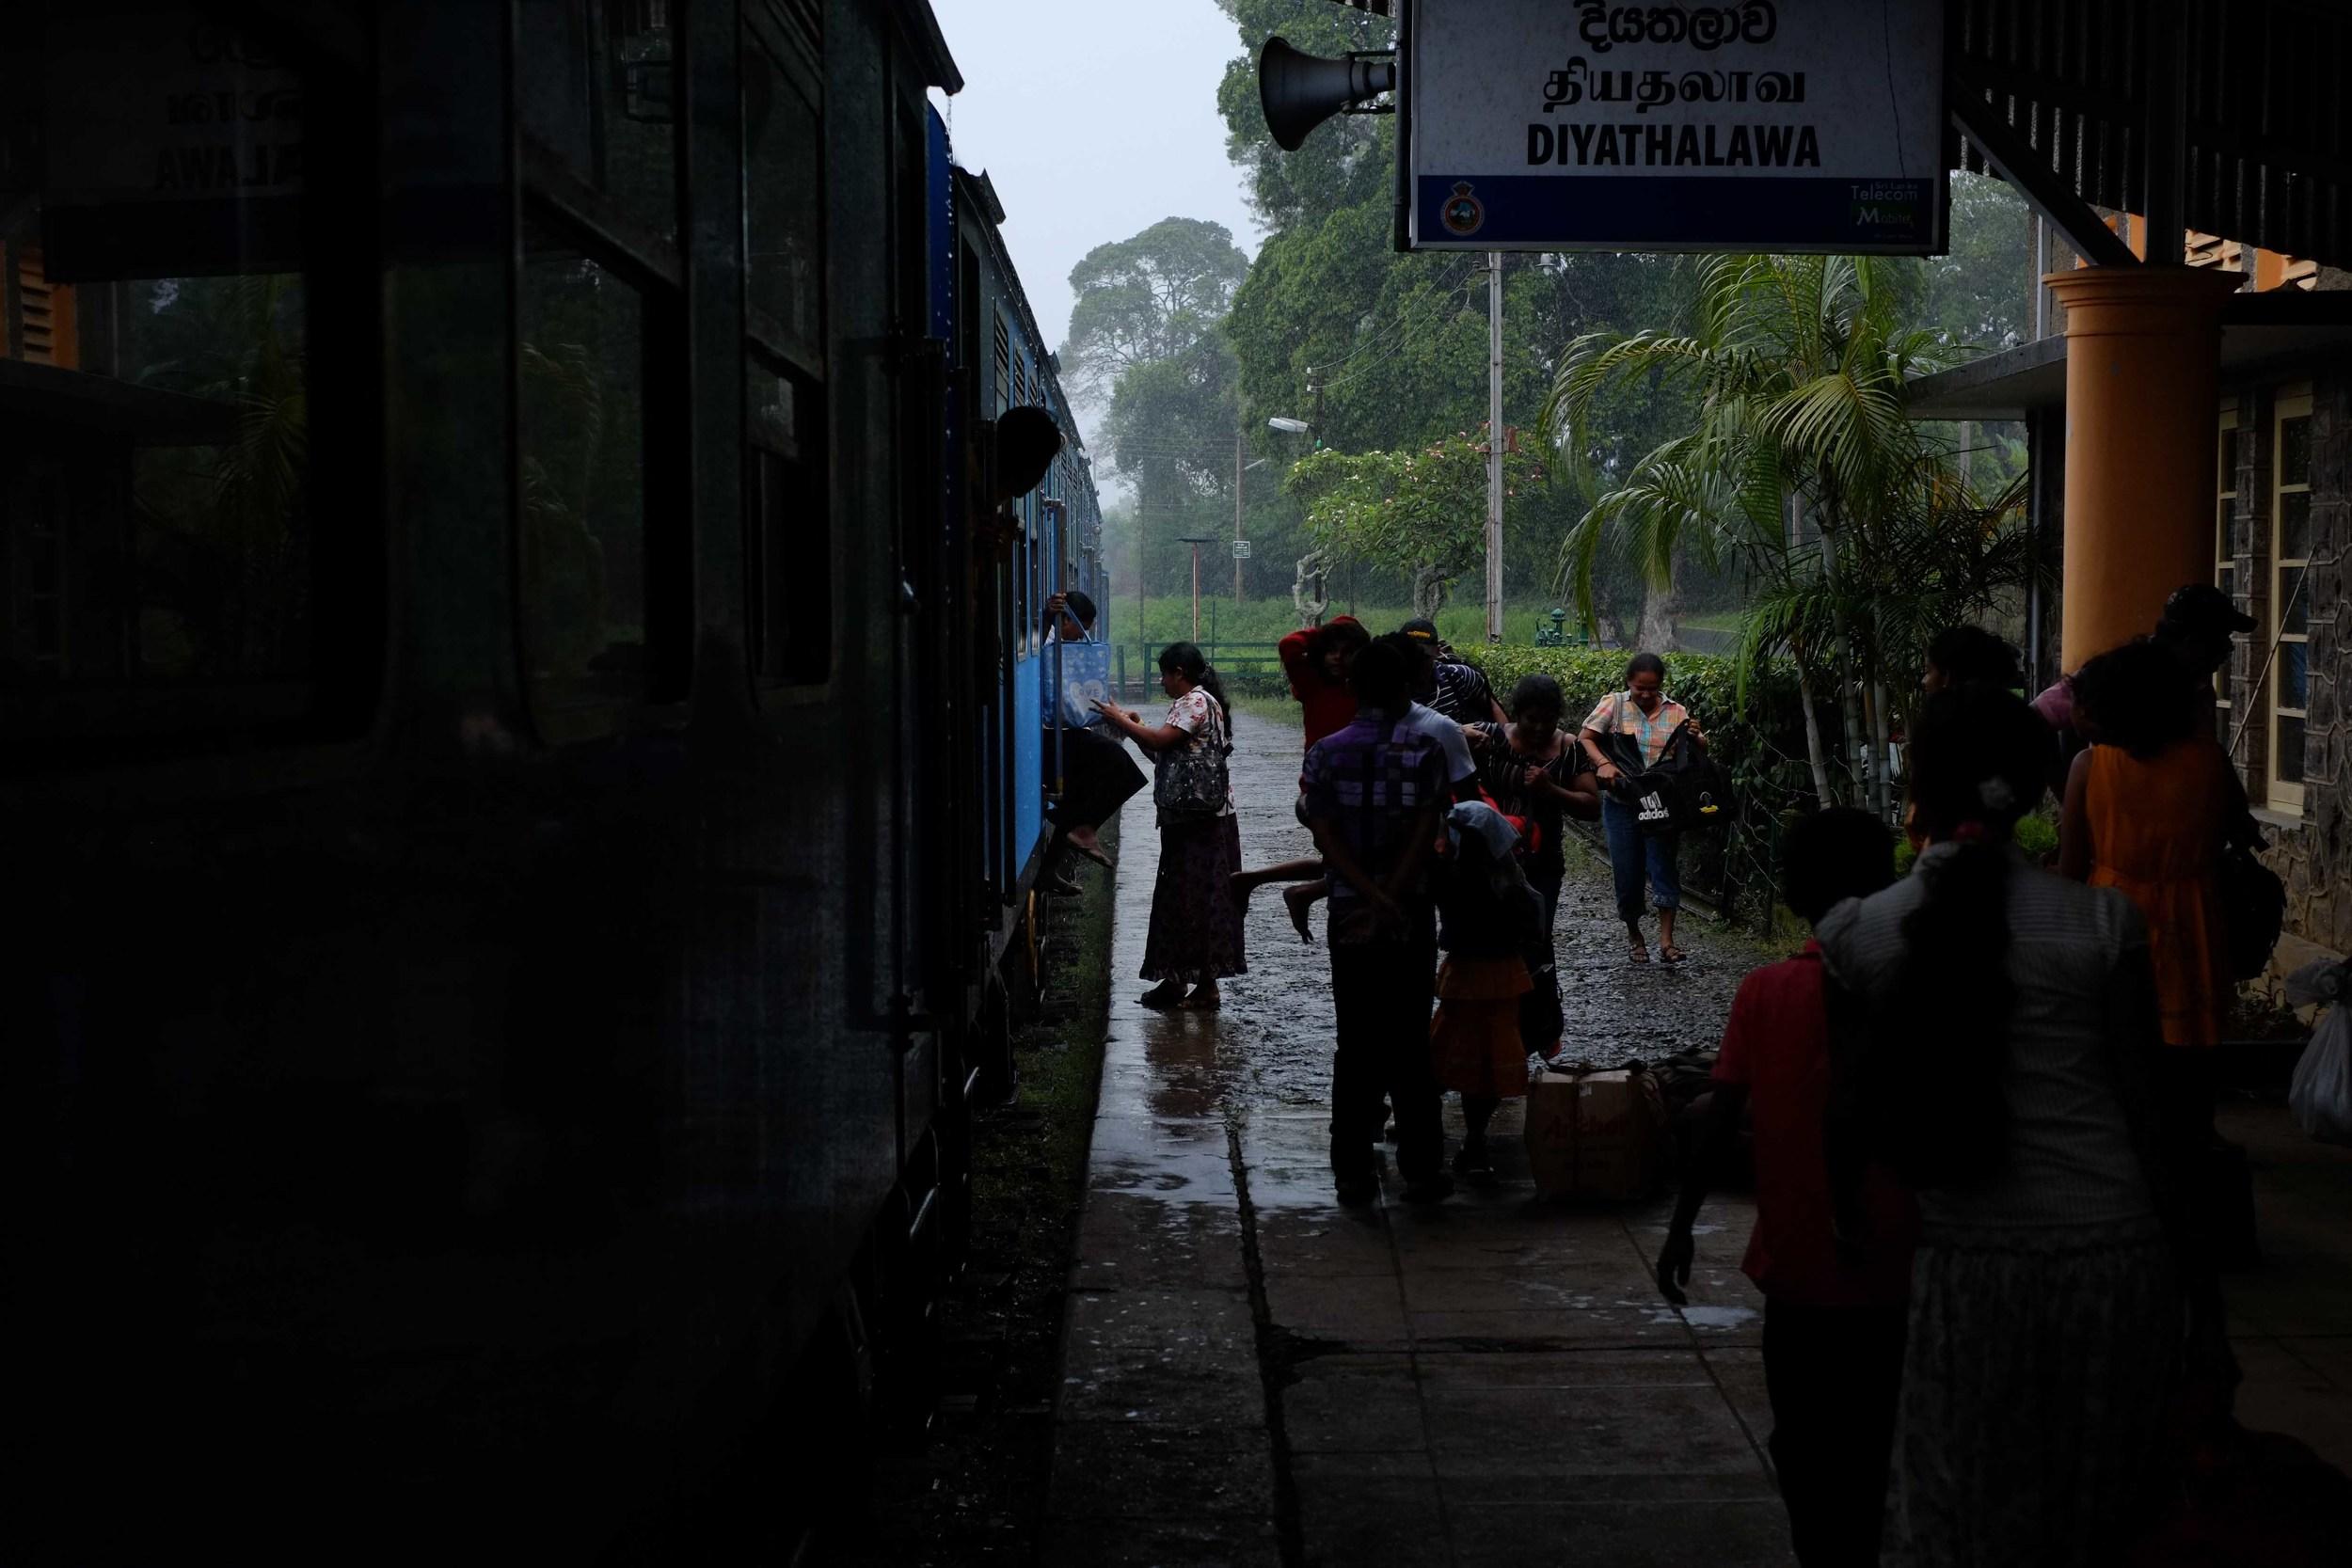 Trains plus rain? Love it!